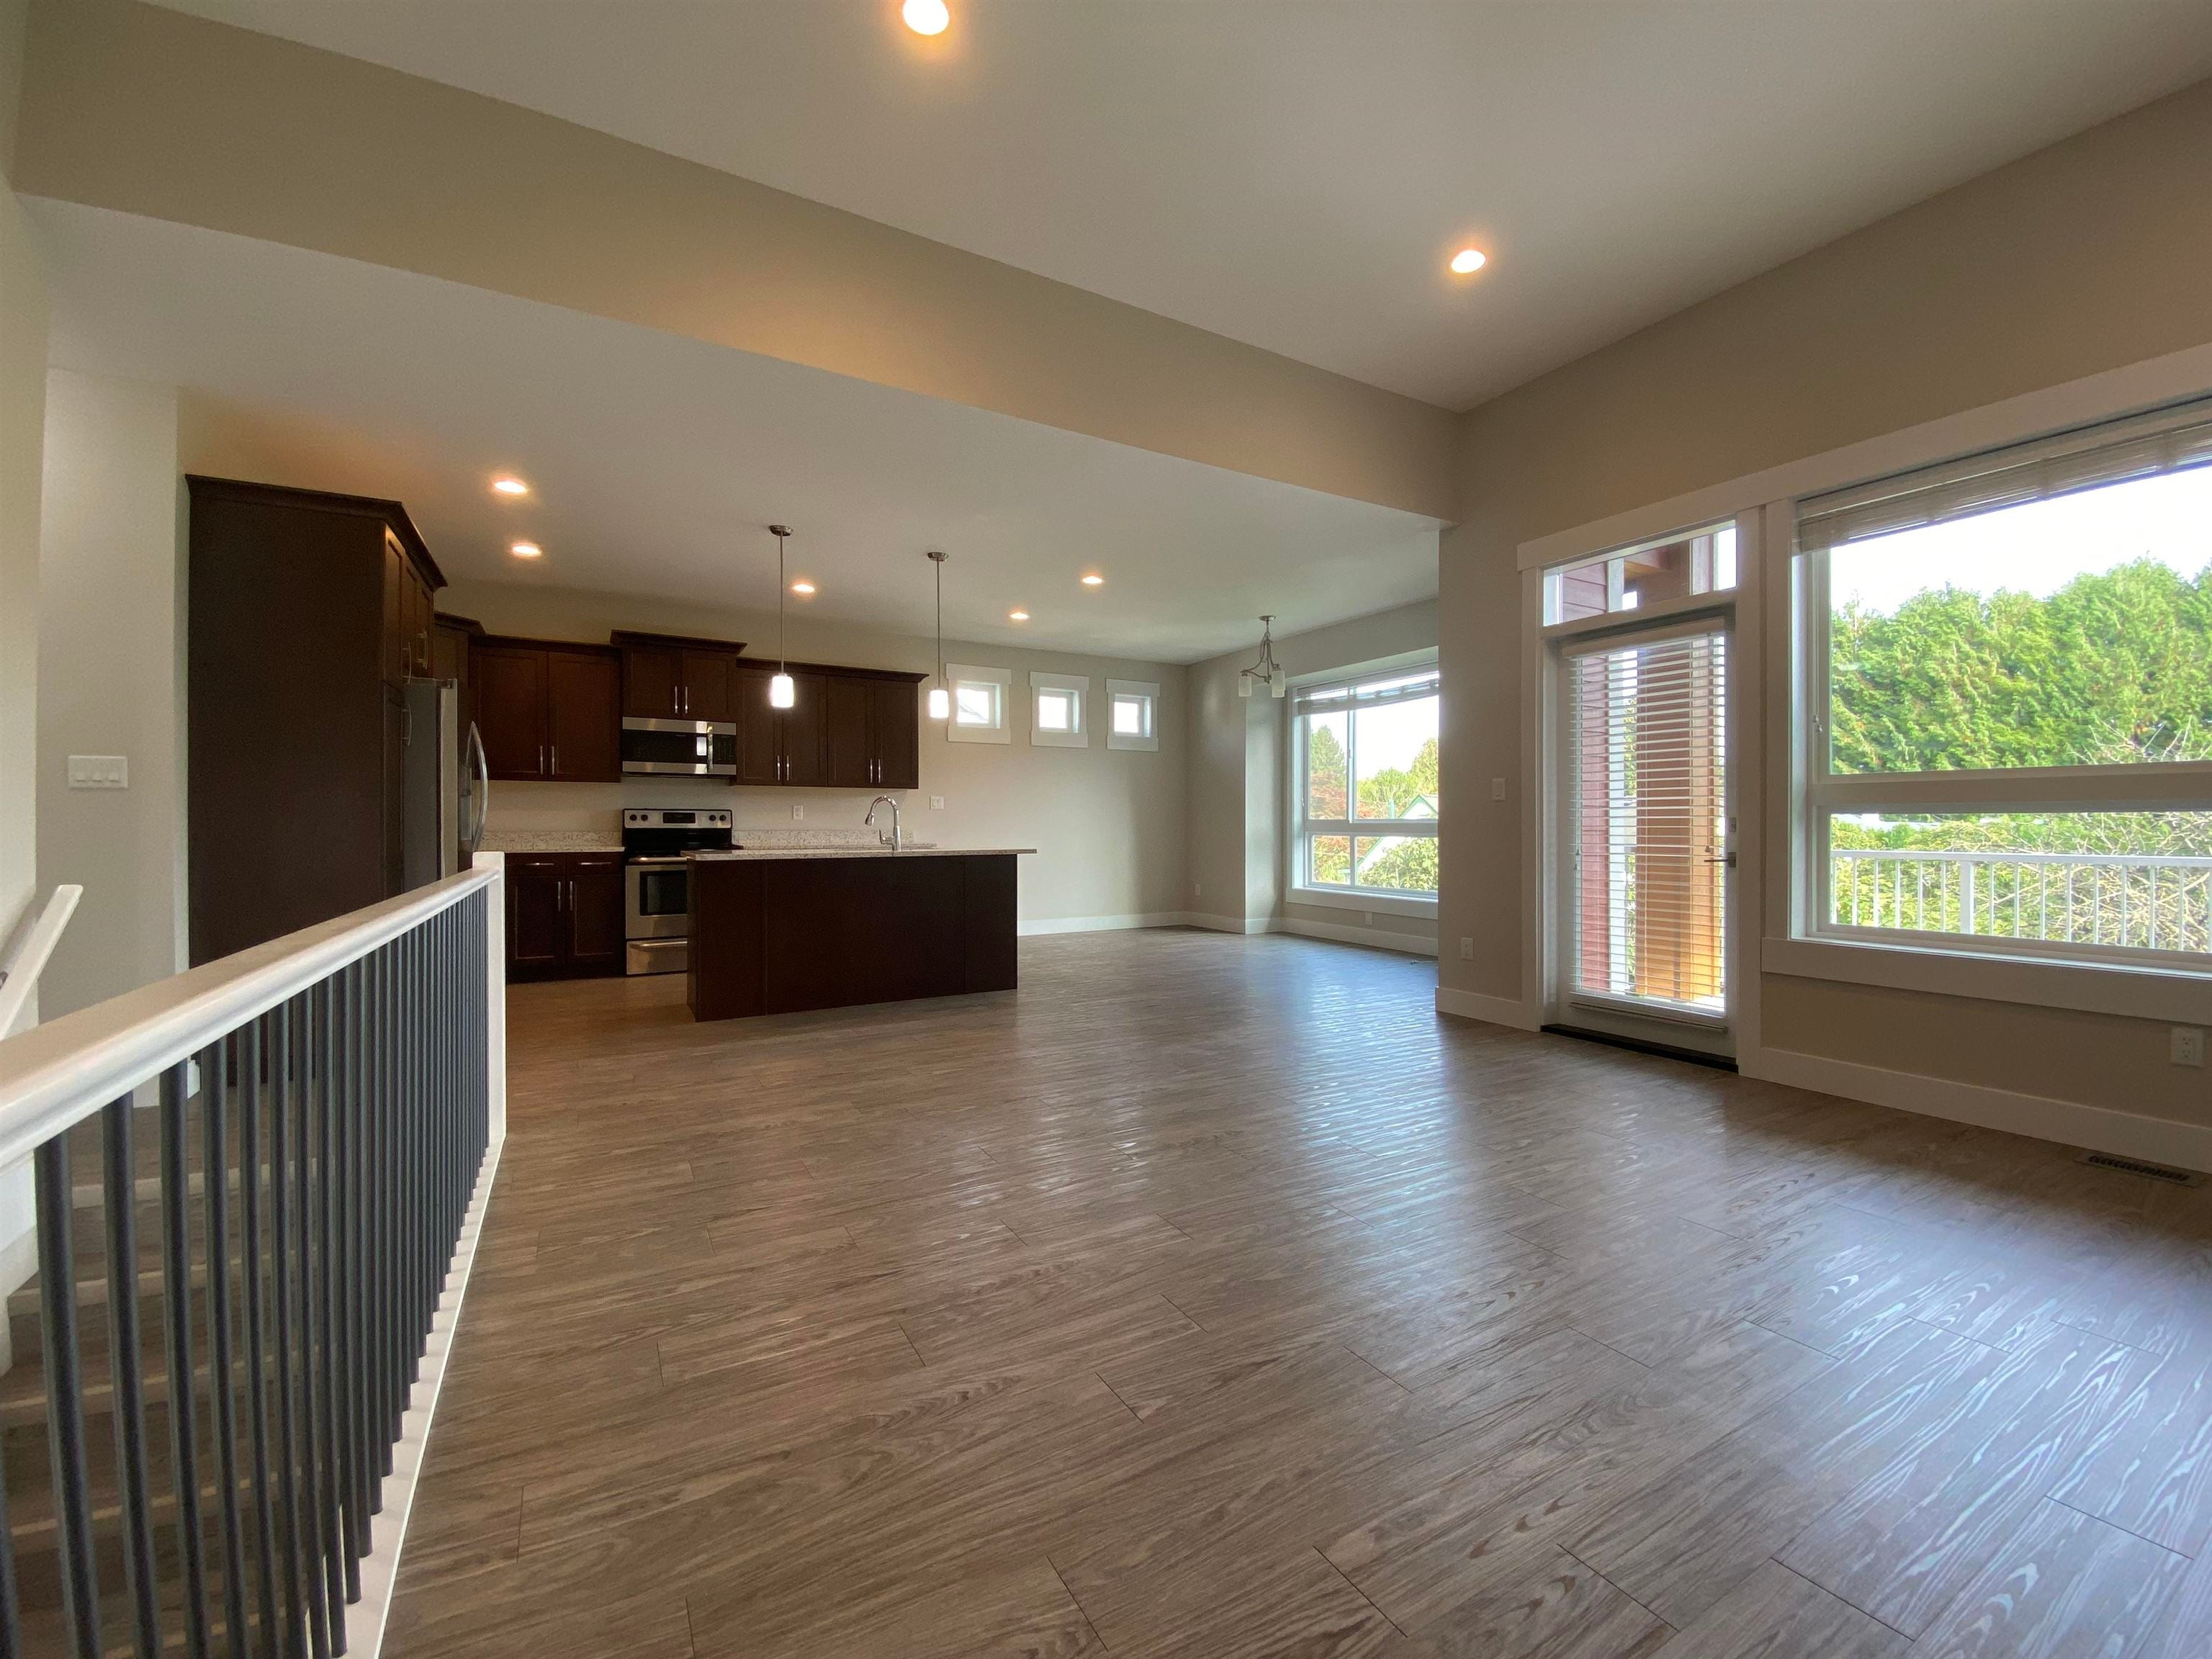 10144 KILLARNEY DRIVE - Fairfield Island House/Single Family for sale, 5 Bedrooms (R2625716) - #12